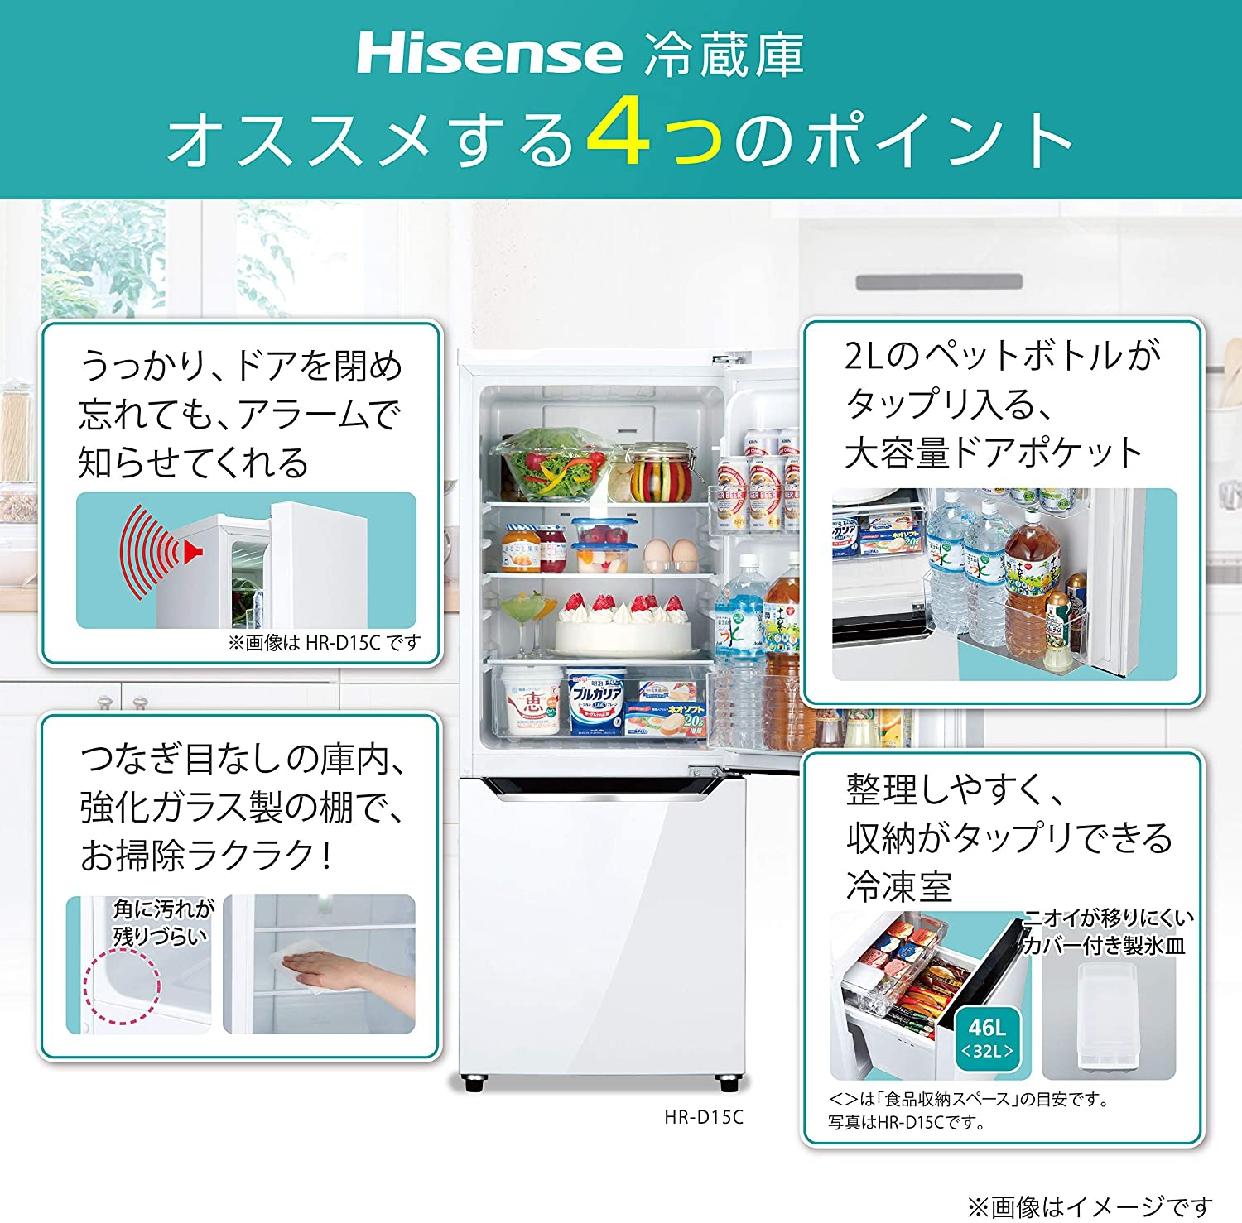 Hisense(ハイセンス)150L 冷凍冷蔵庫 HR-D15Cの商品画像9